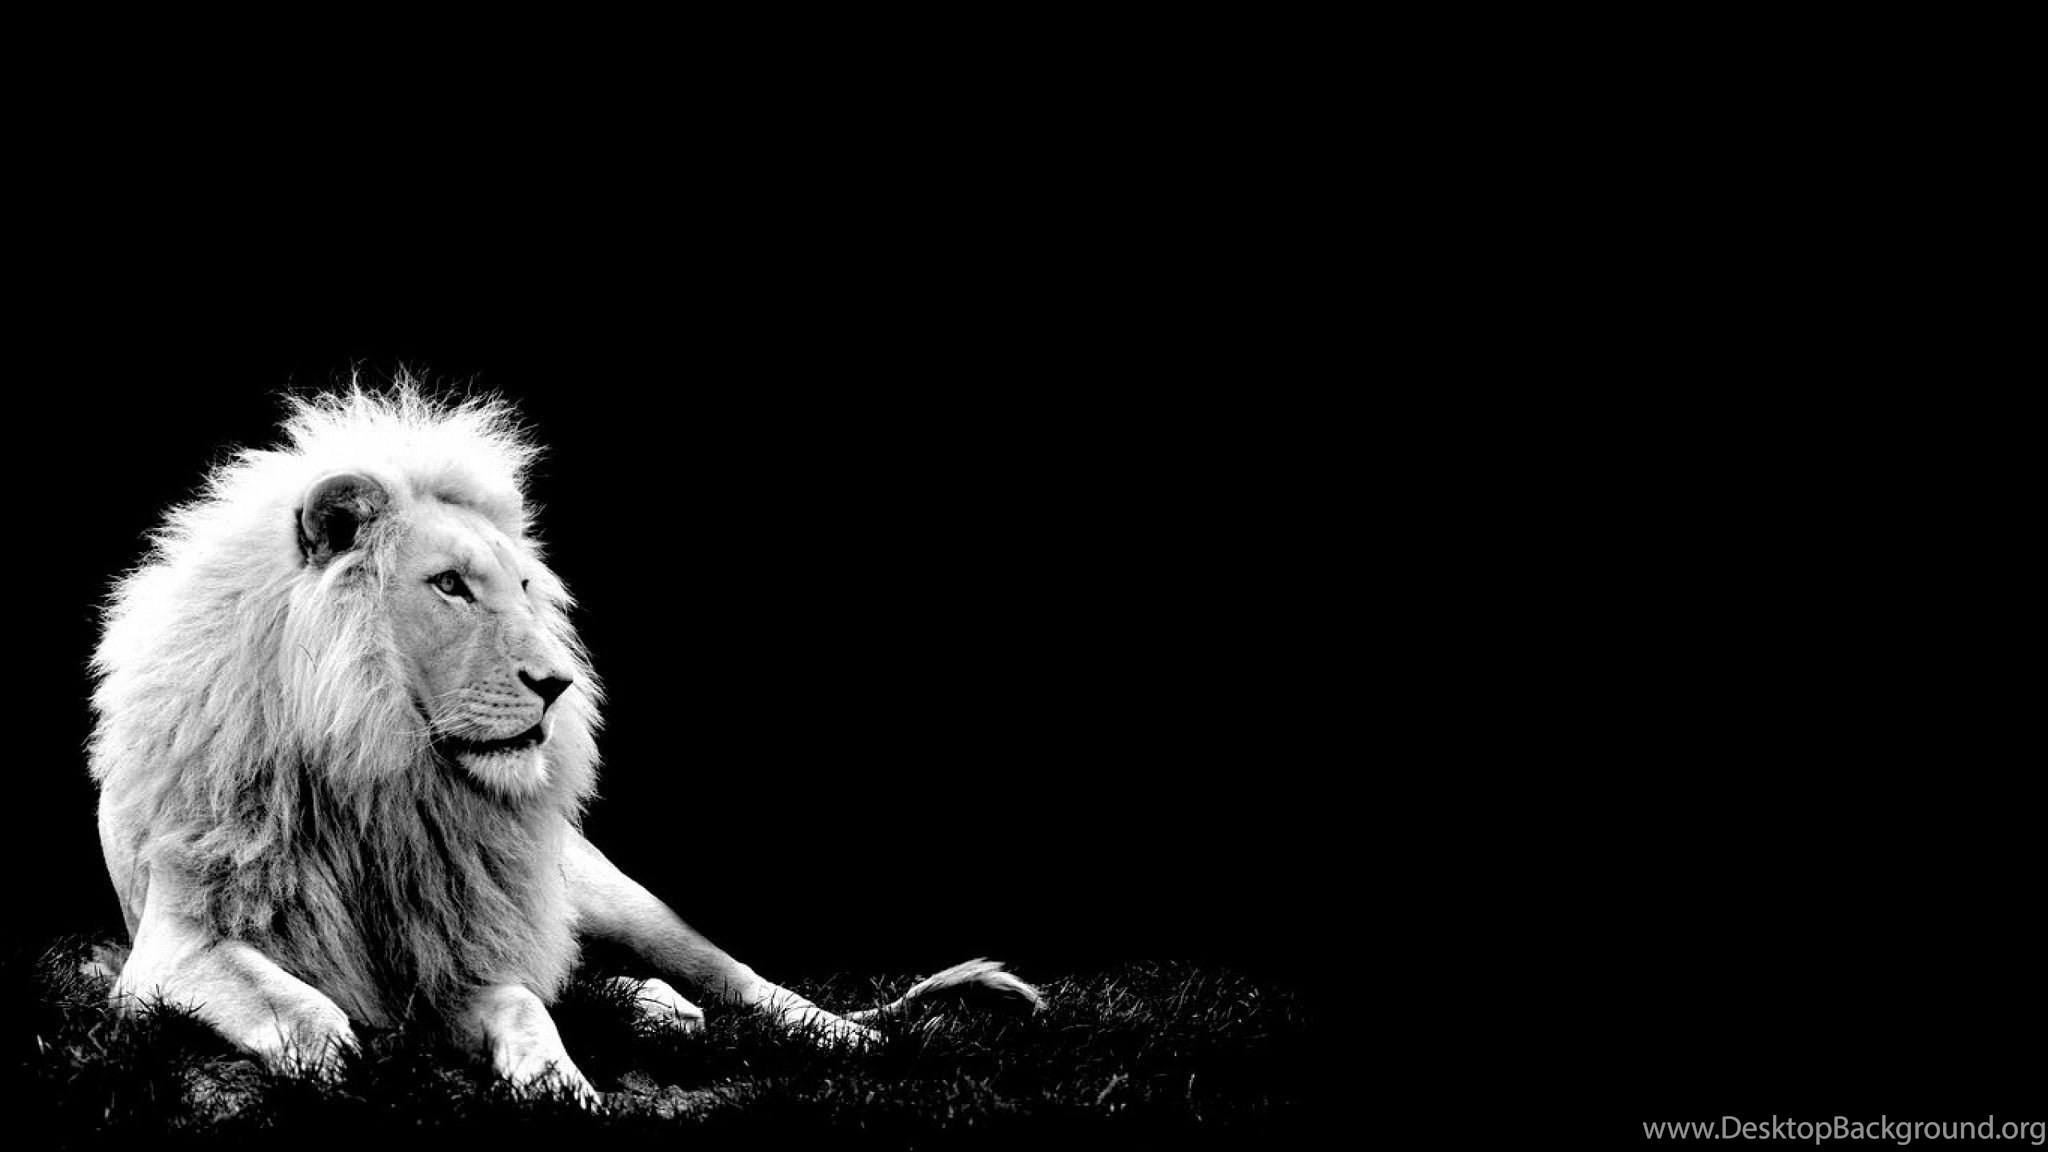 Wallpapers White Lion Hd Cub King Desktop Background